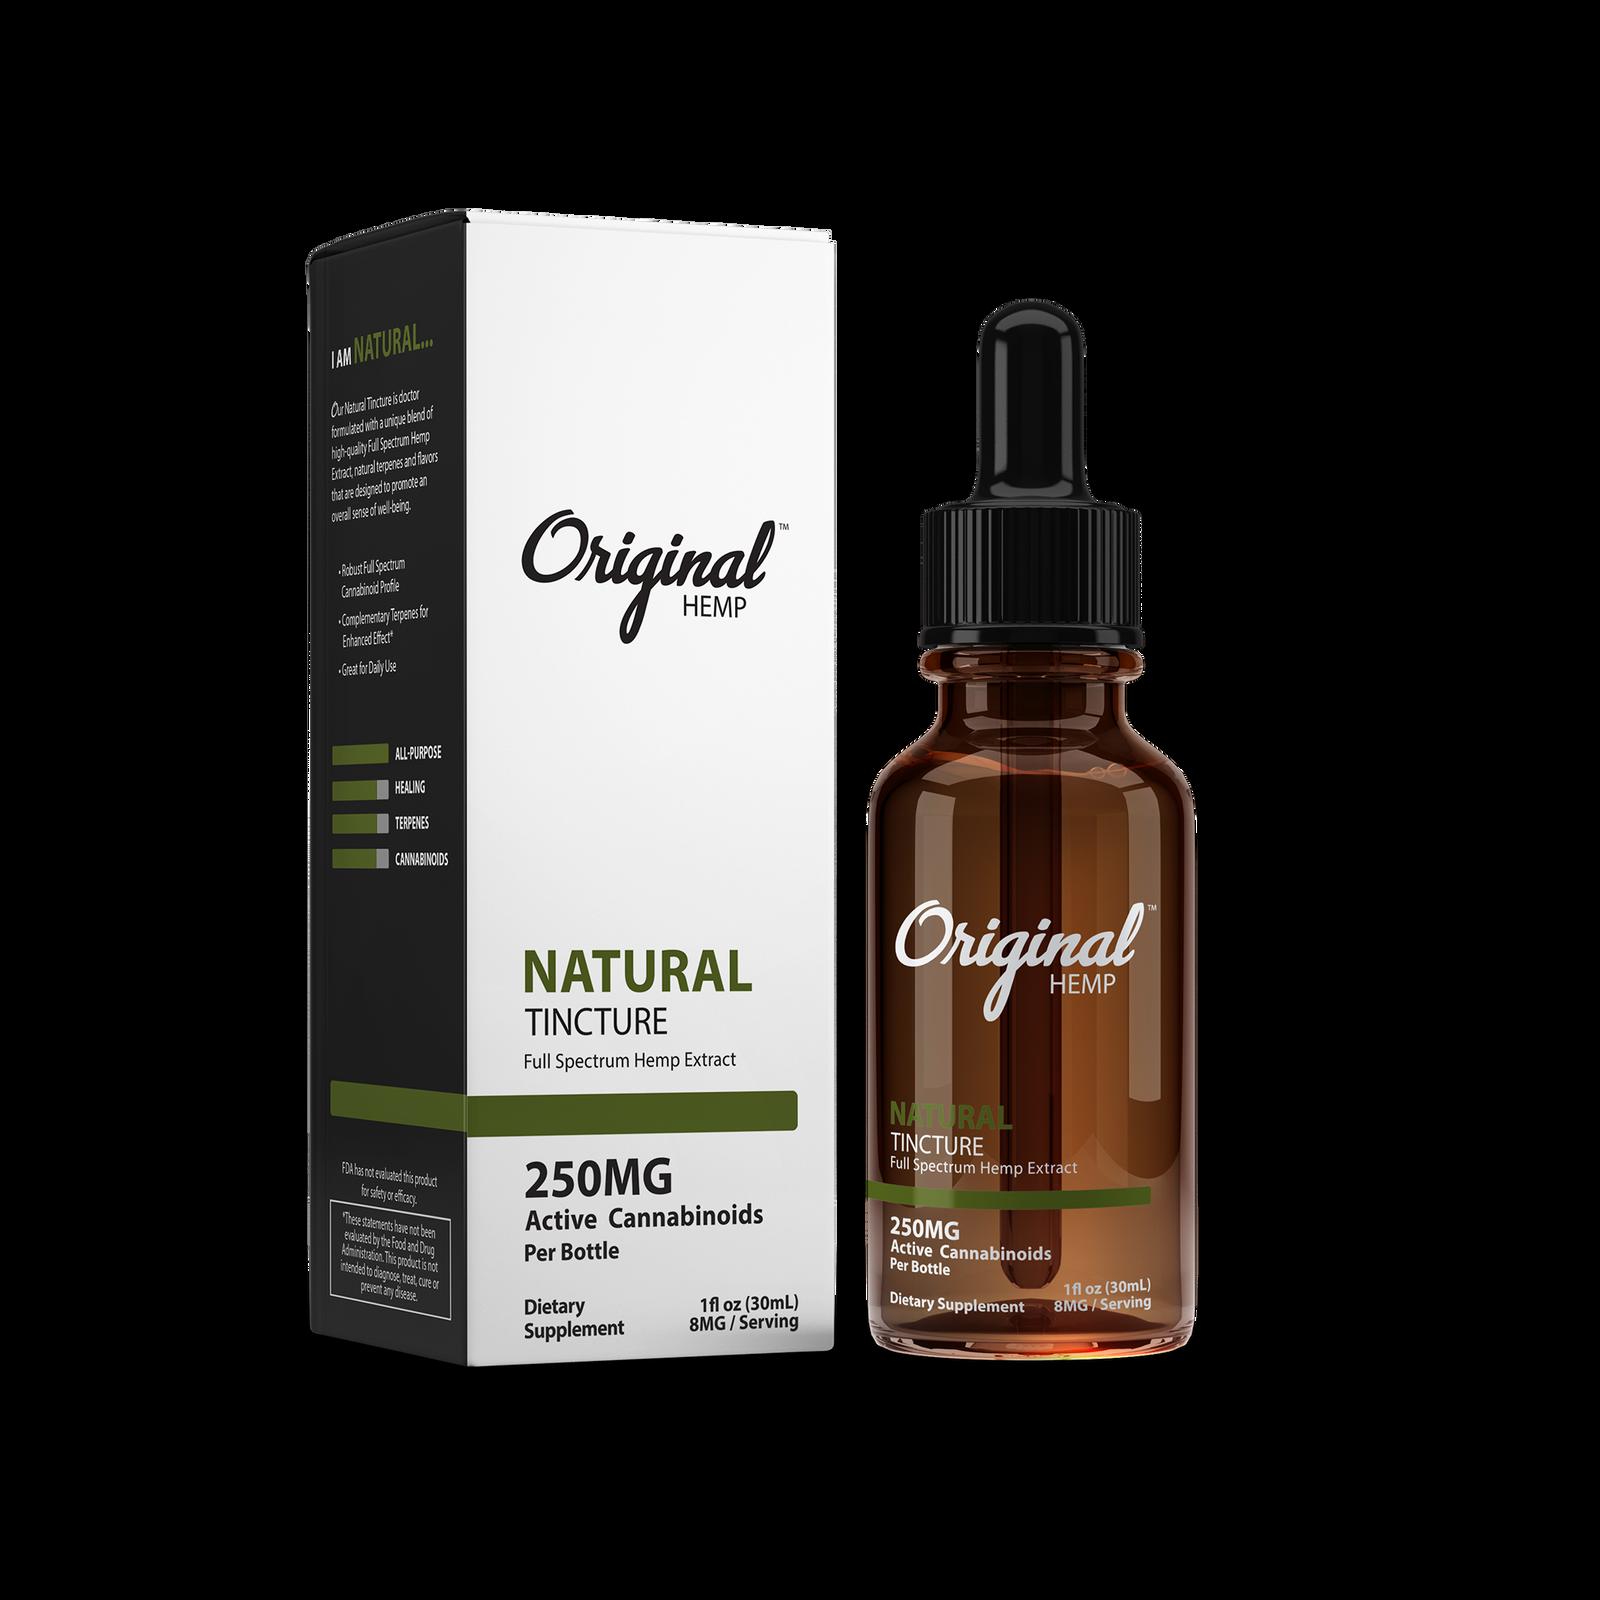 Natural MCT Oil by Original Hemp